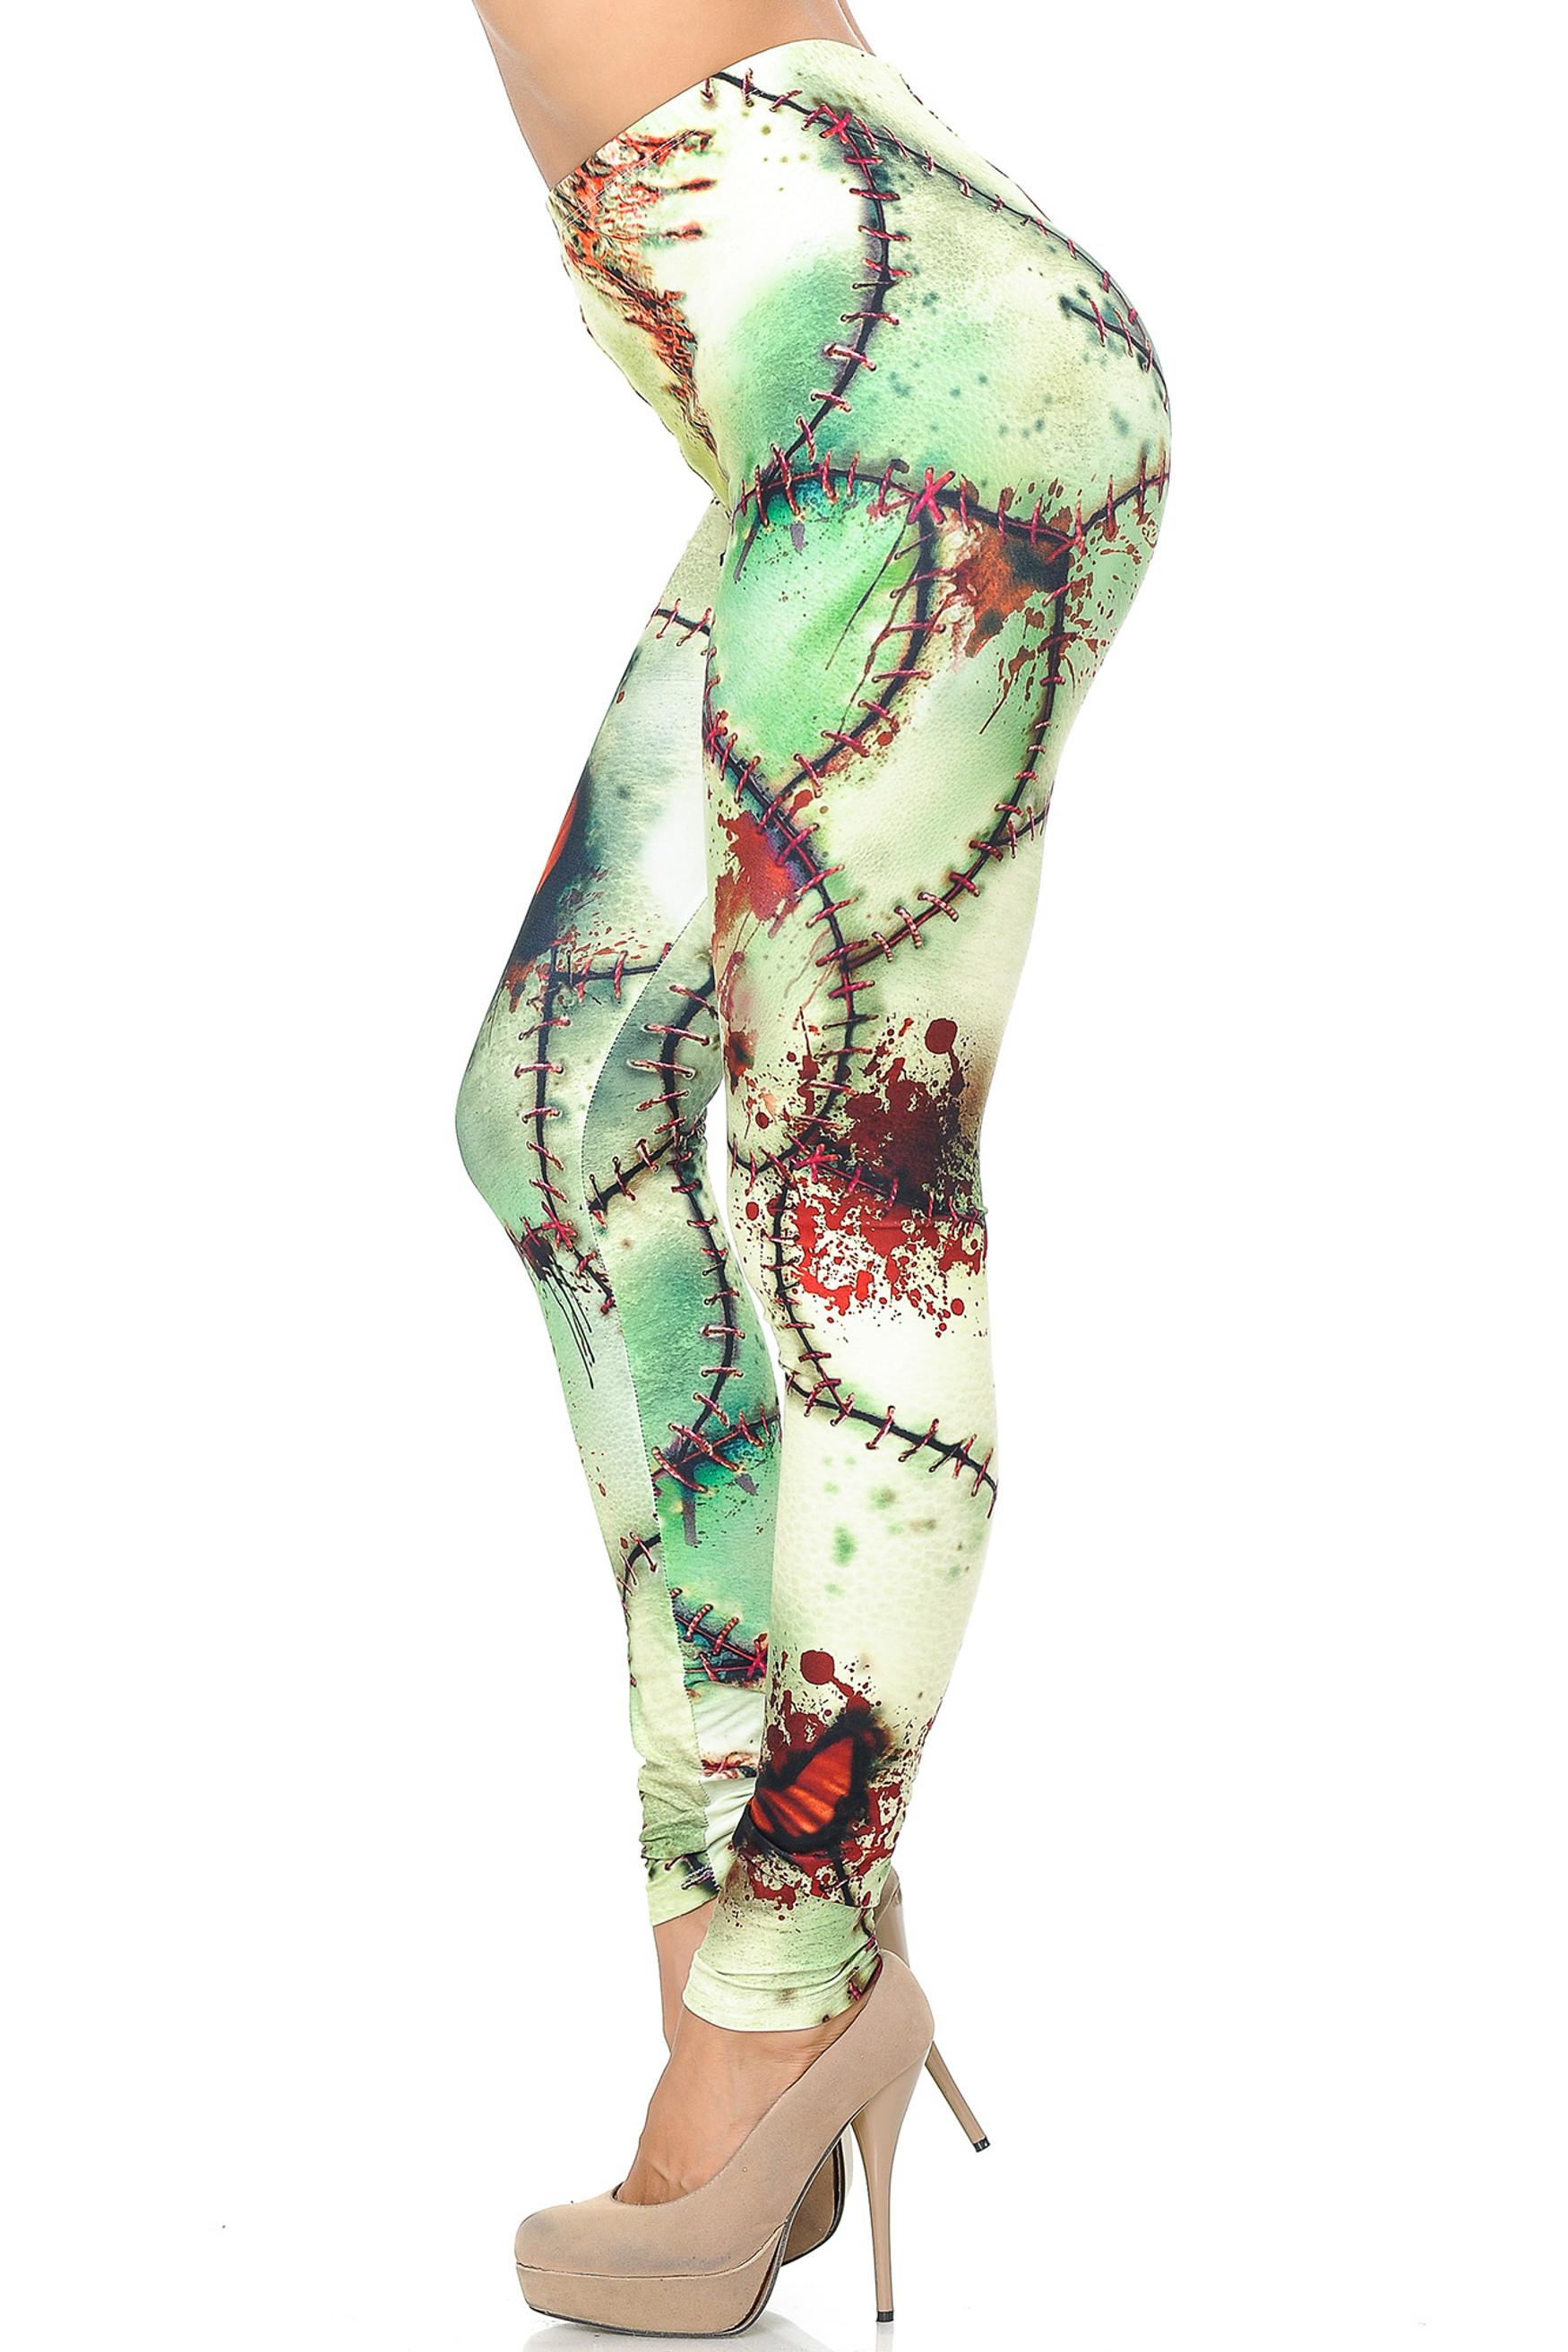 Creamy Soft Zombie Leggings - USA Fashion™